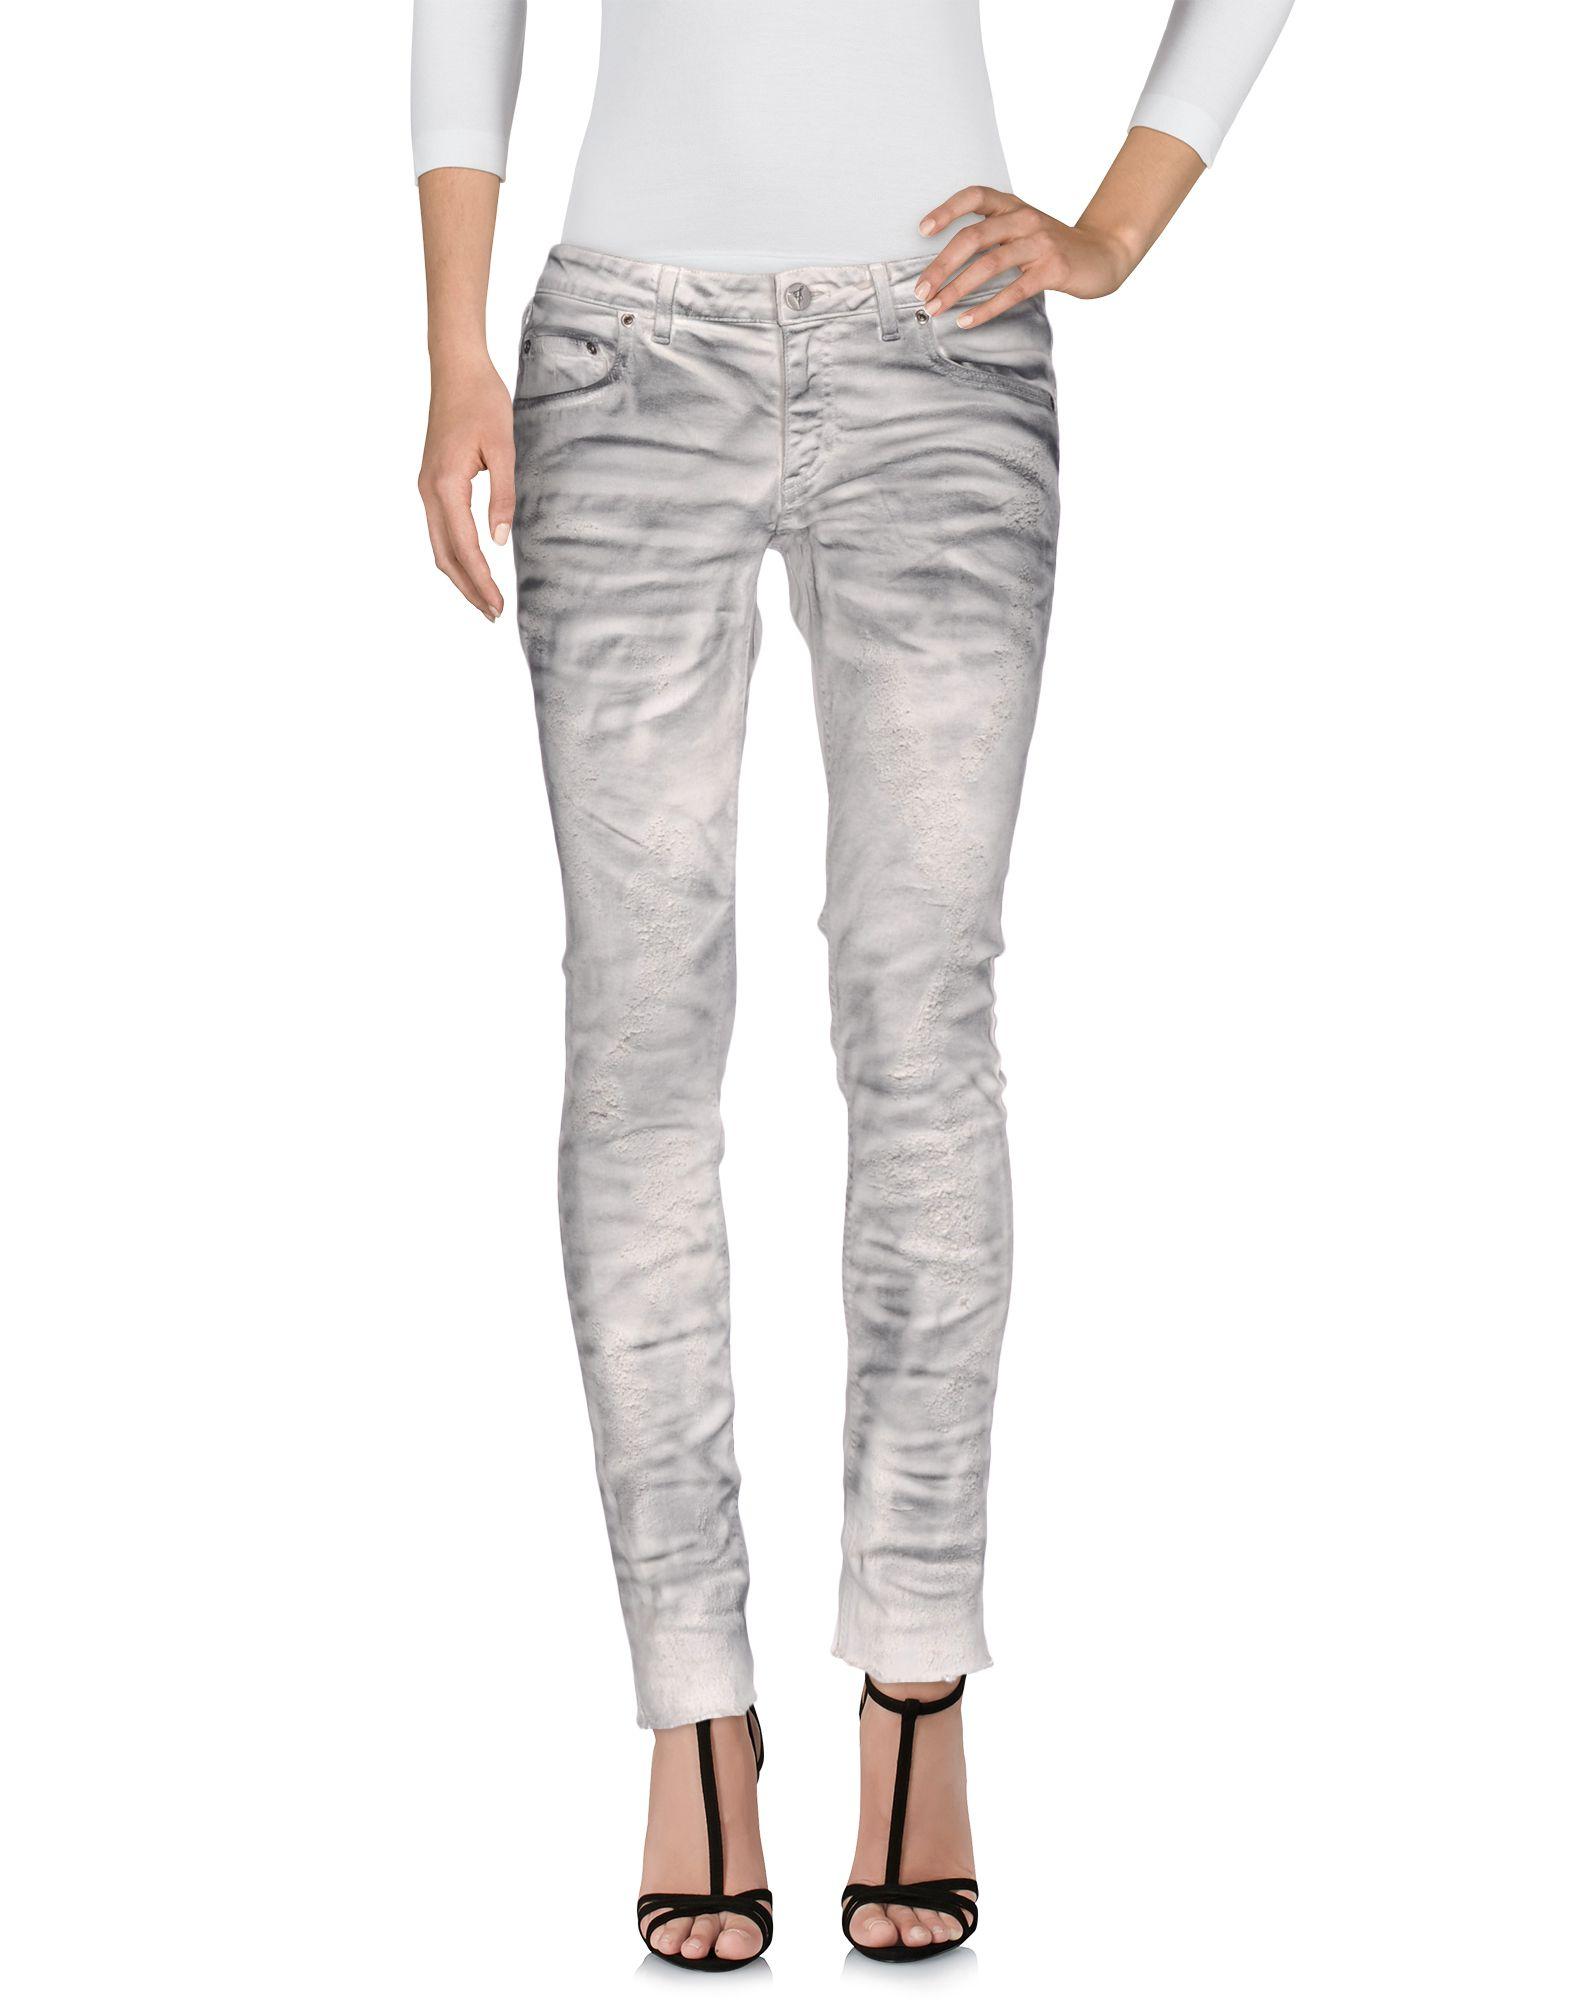 FAGASSENT Denim Pants in Light Grey